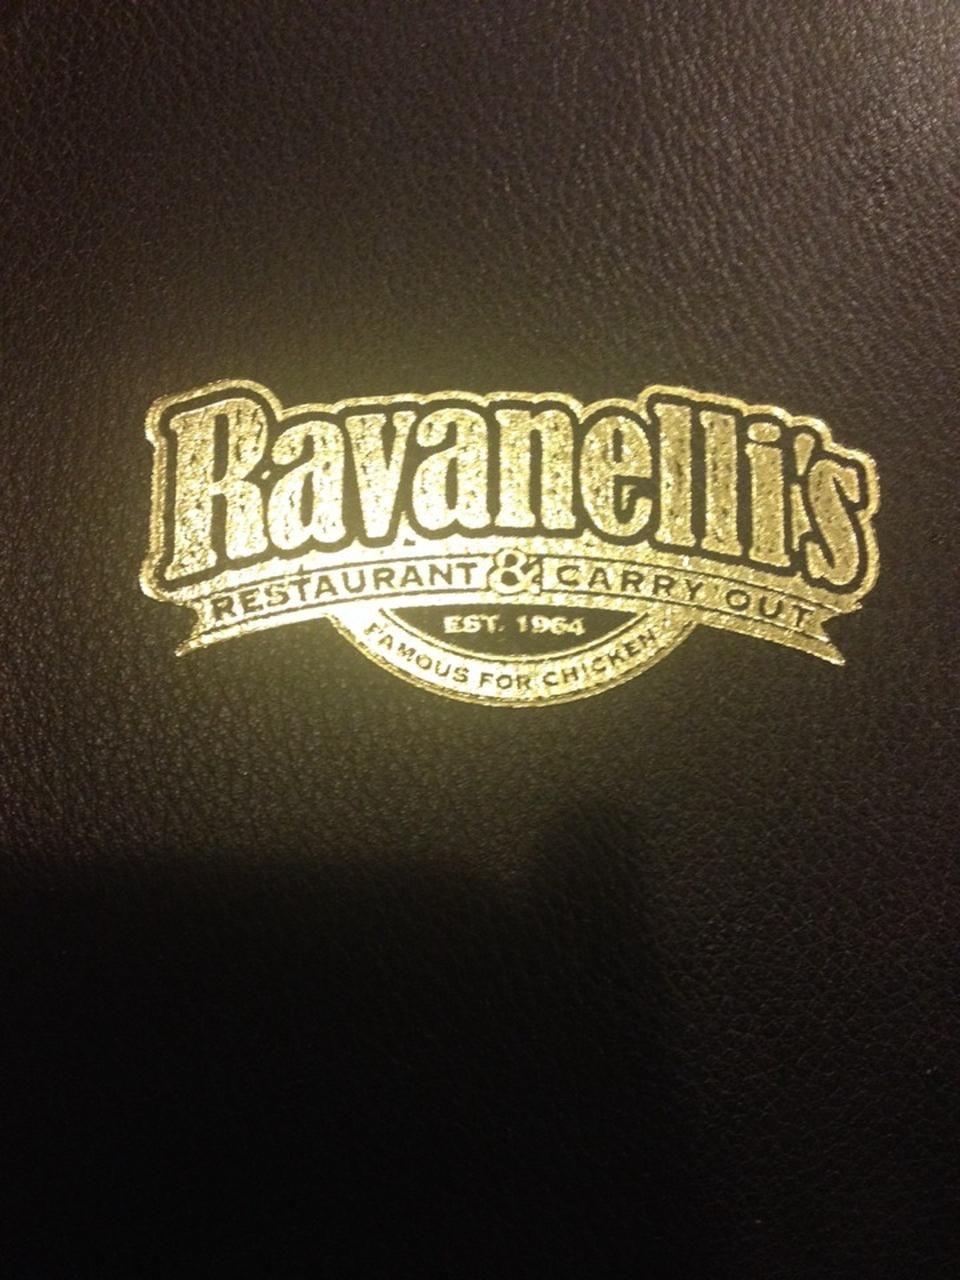 Ravanelli S 3 American Vlg Granite City East St Louis Granite City Road Trip